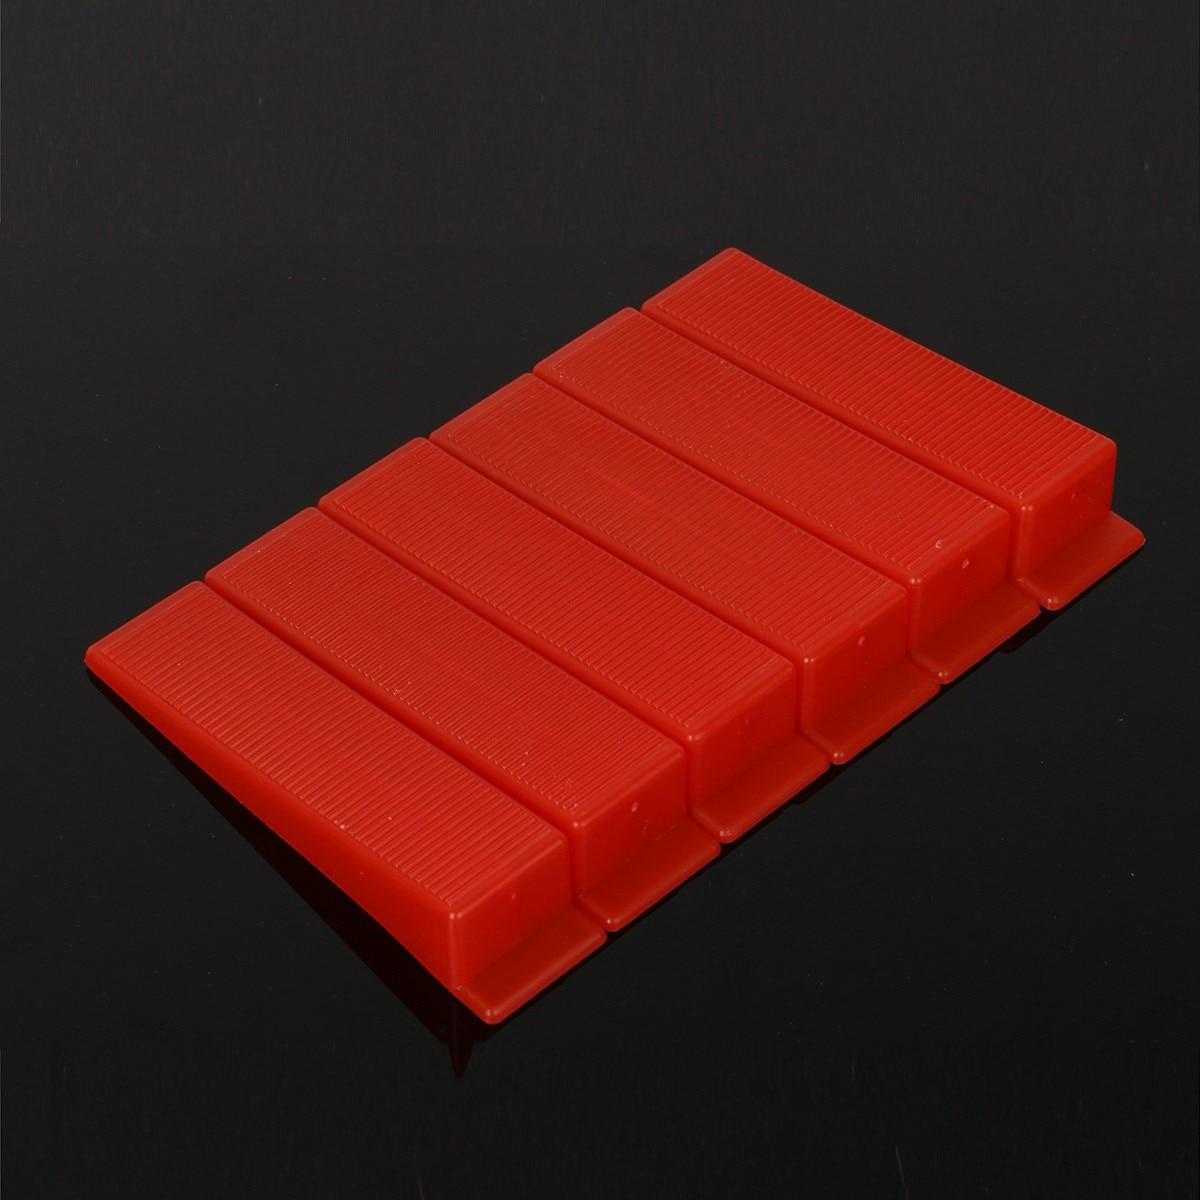 где купить  50pcs/set Red Wedges for Tile Leveling System Plastic 88x22mm For Floor tiles and wall tiles Spacers Tiling Tools Favorable  по лучшей цене